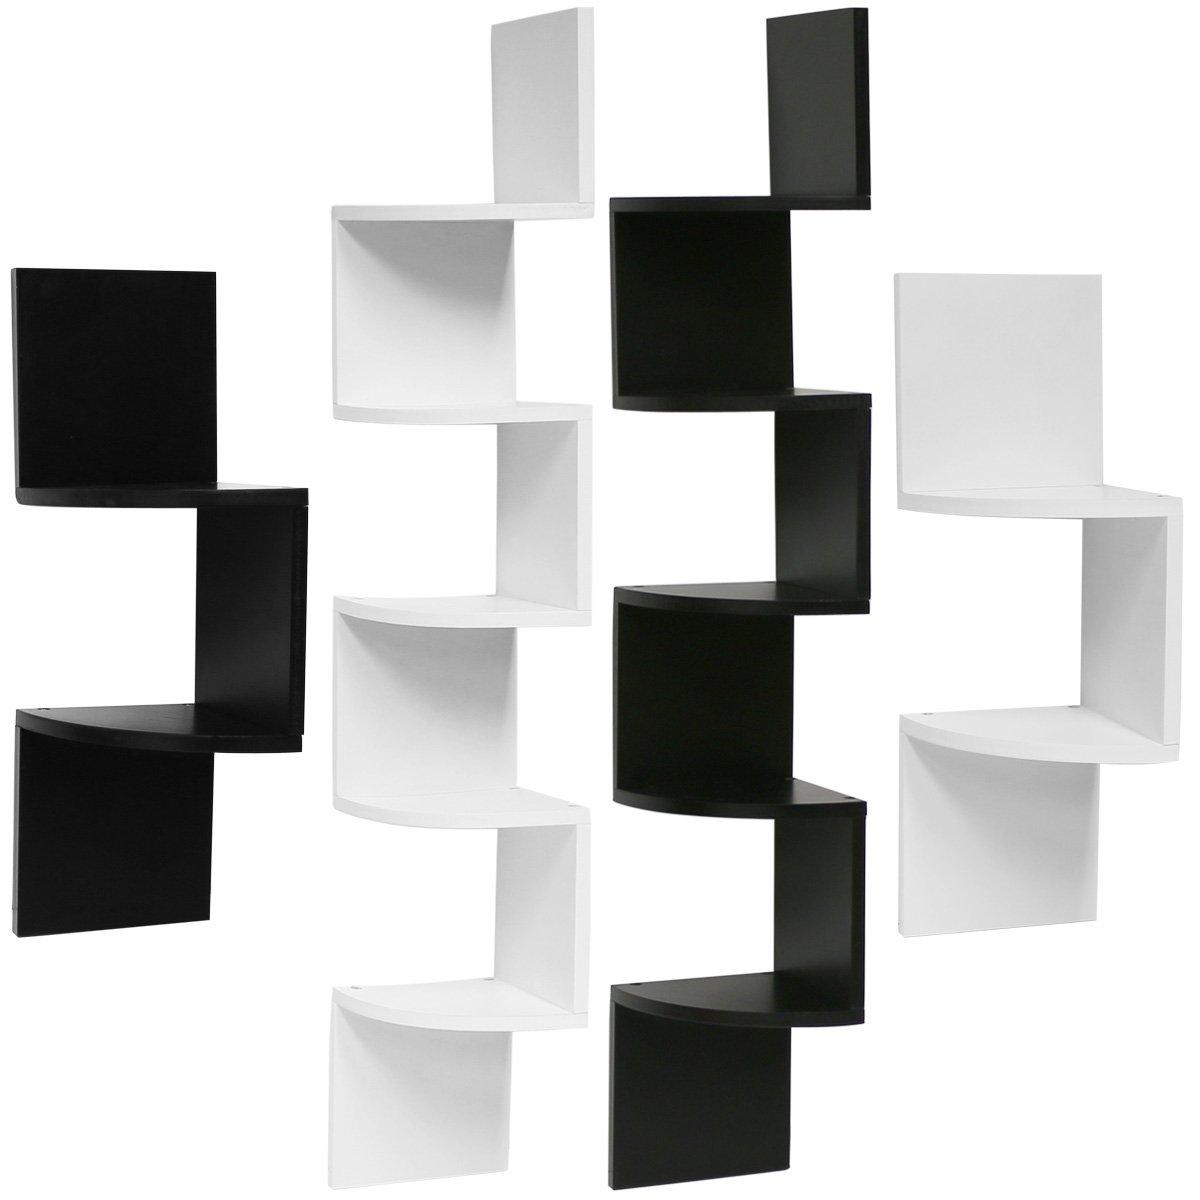 hartleys zig zag corner wall shelf unit  choice of size  colour  - hartleys zig zag corner wall shelf unit  choice of size  colouramazoncouk kitchen  home